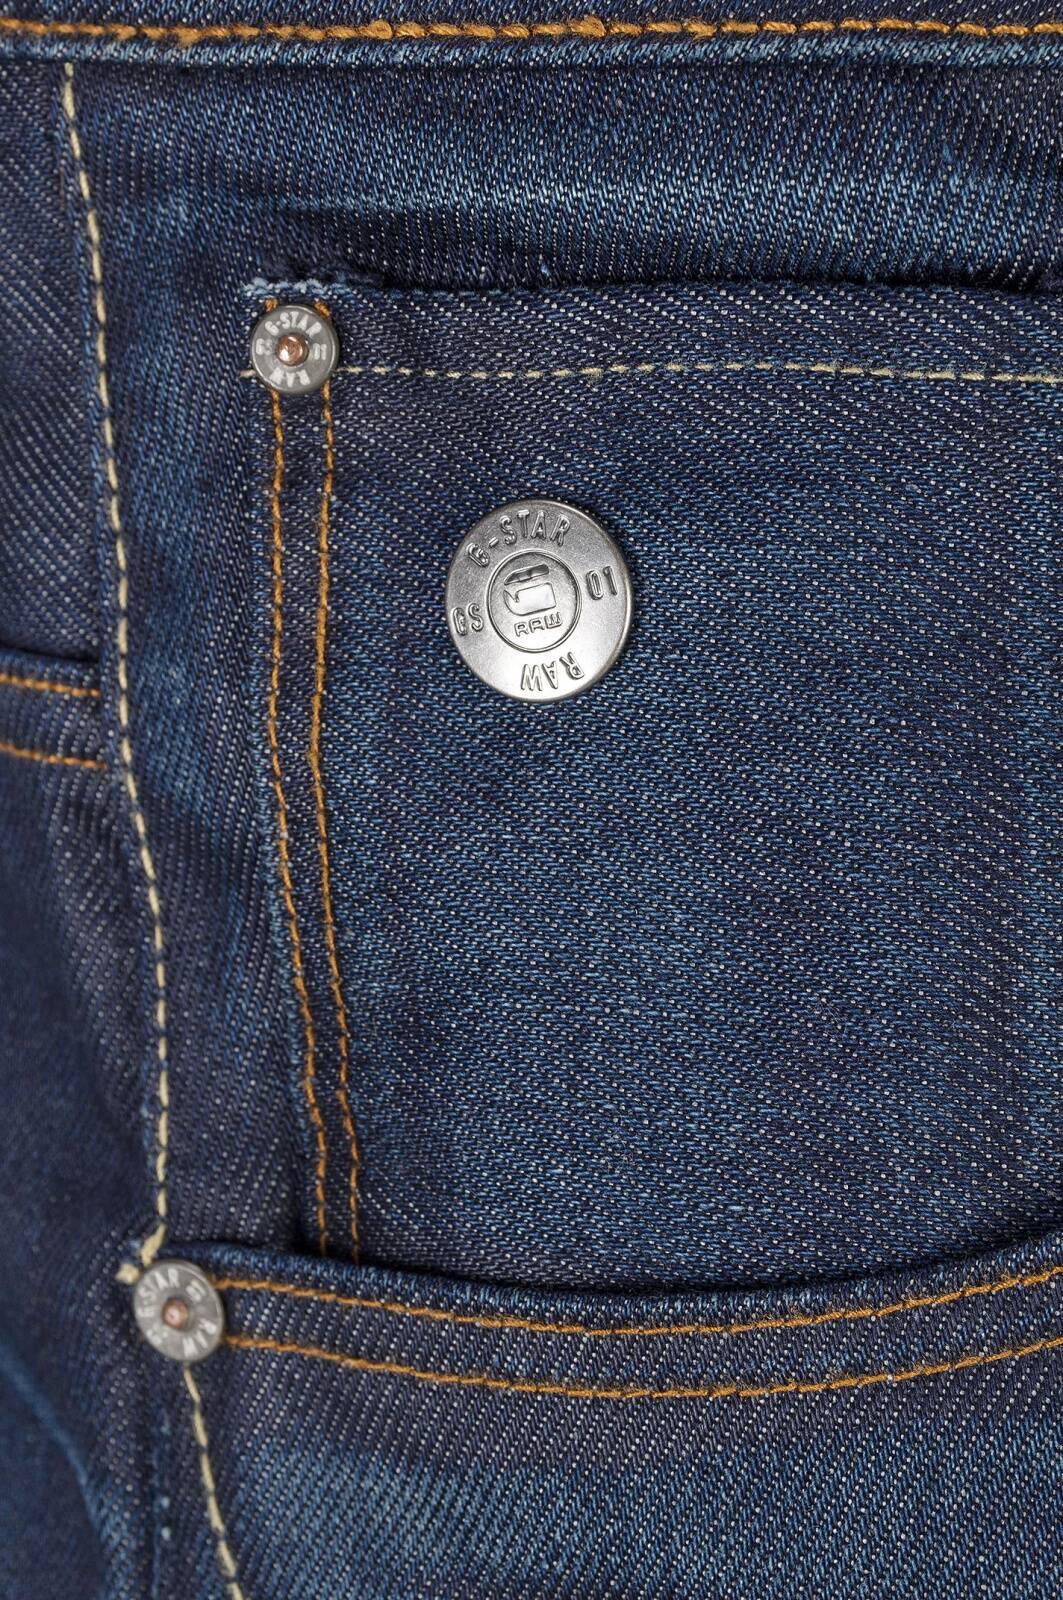 arc 3d slim jeans g star raw navy blue jeans pants. Black Bedroom Furniture Sets. Home Design Ideas